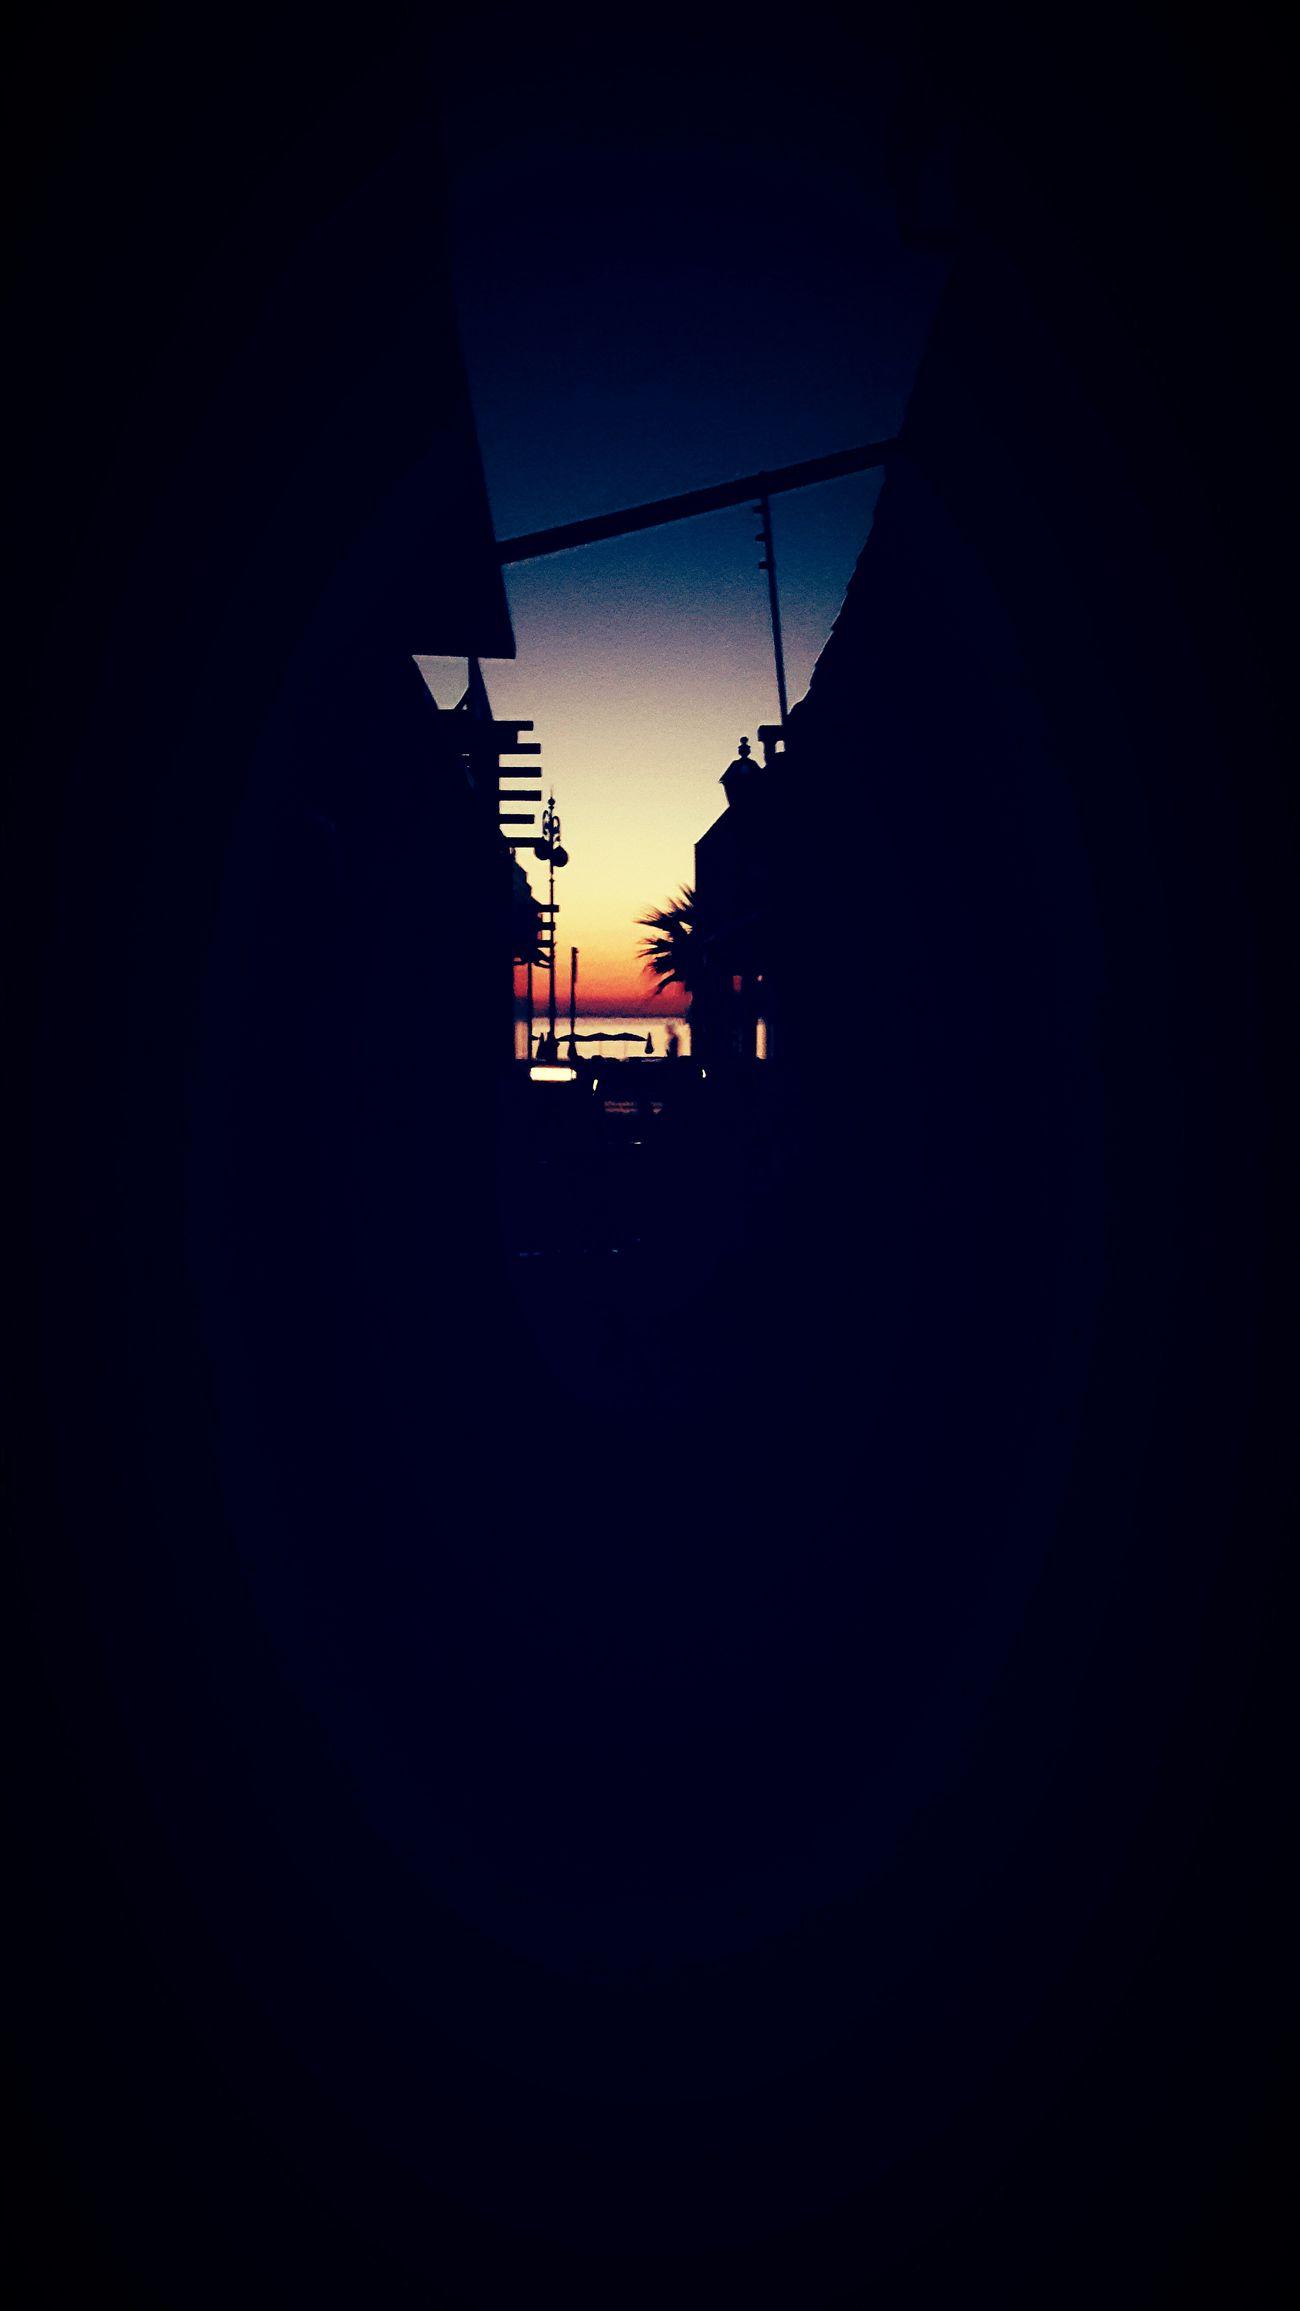 Morning Morning Light Morning Sky Morning Sun Larnaca, Cyprus Larnaka Cyprus Larnaca Town Colours Of Nature Heartcyprus Secretplace Black Blacknblue Folkcreative Folkmagazine Eclectic_shotz